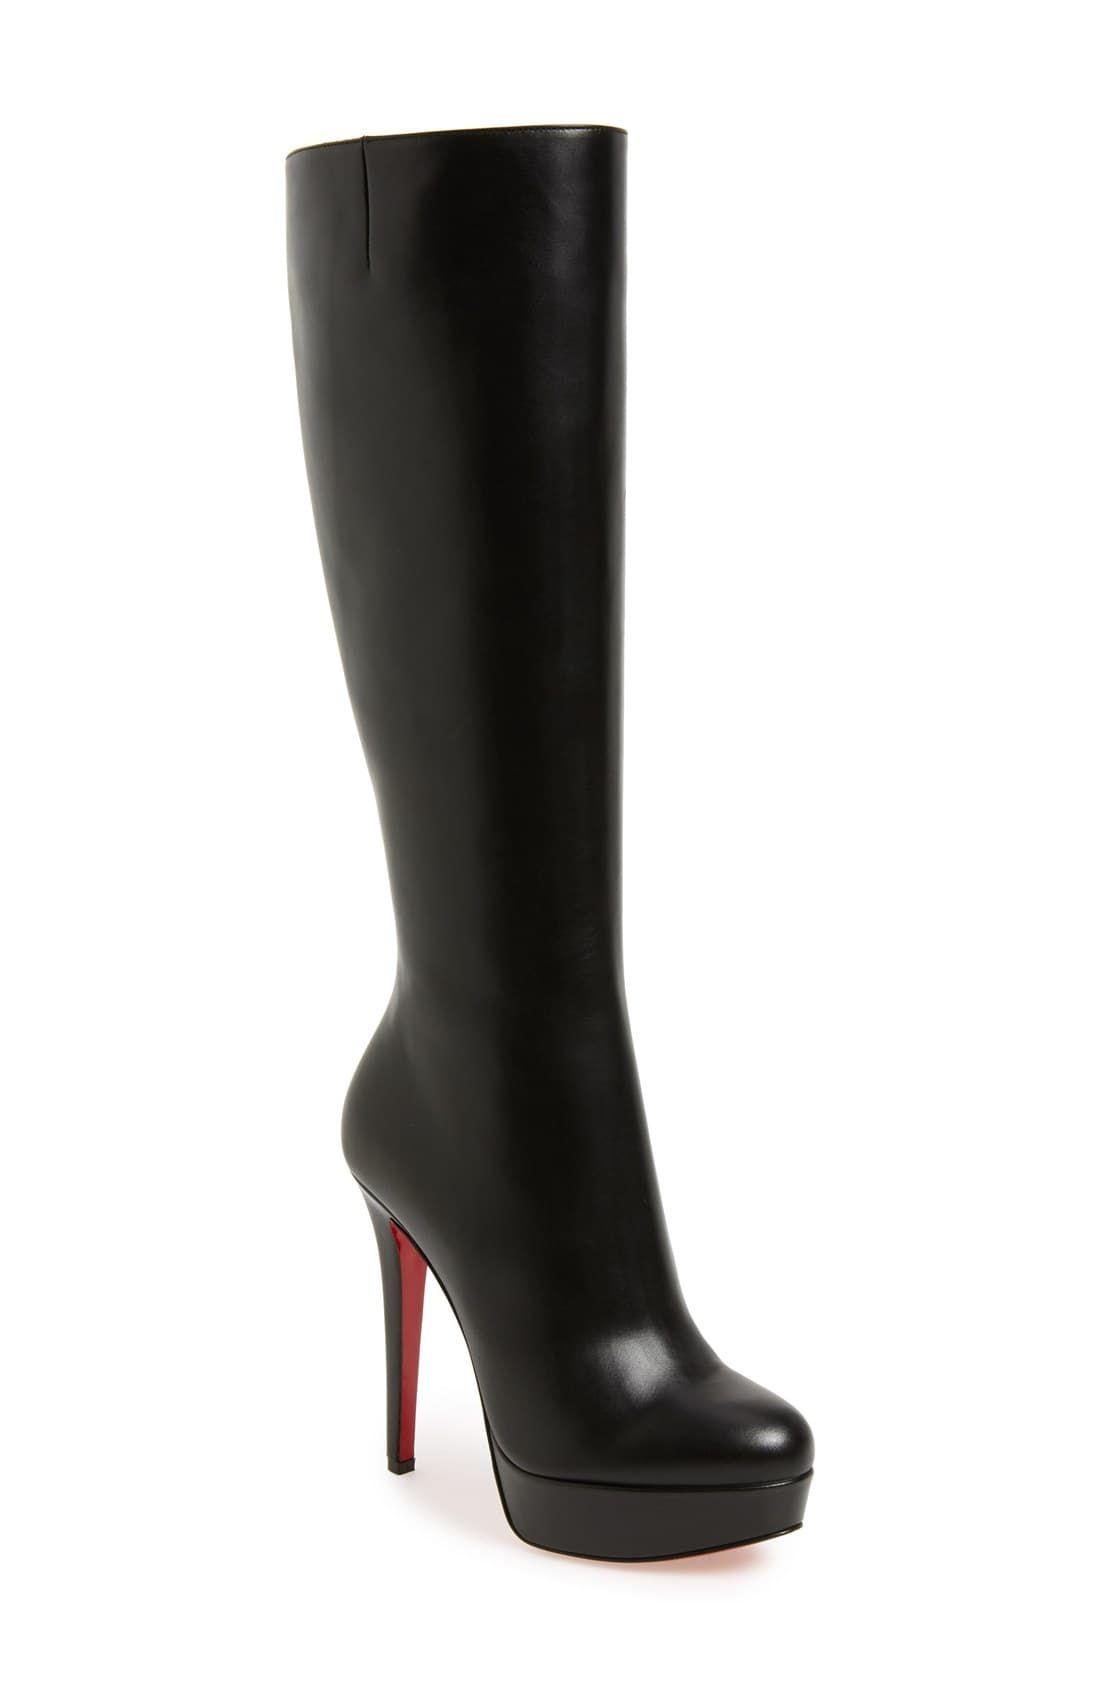 new style dfe66 29106 Women's Christian Louboutin 'Bianca Botta' Platform Boot ...